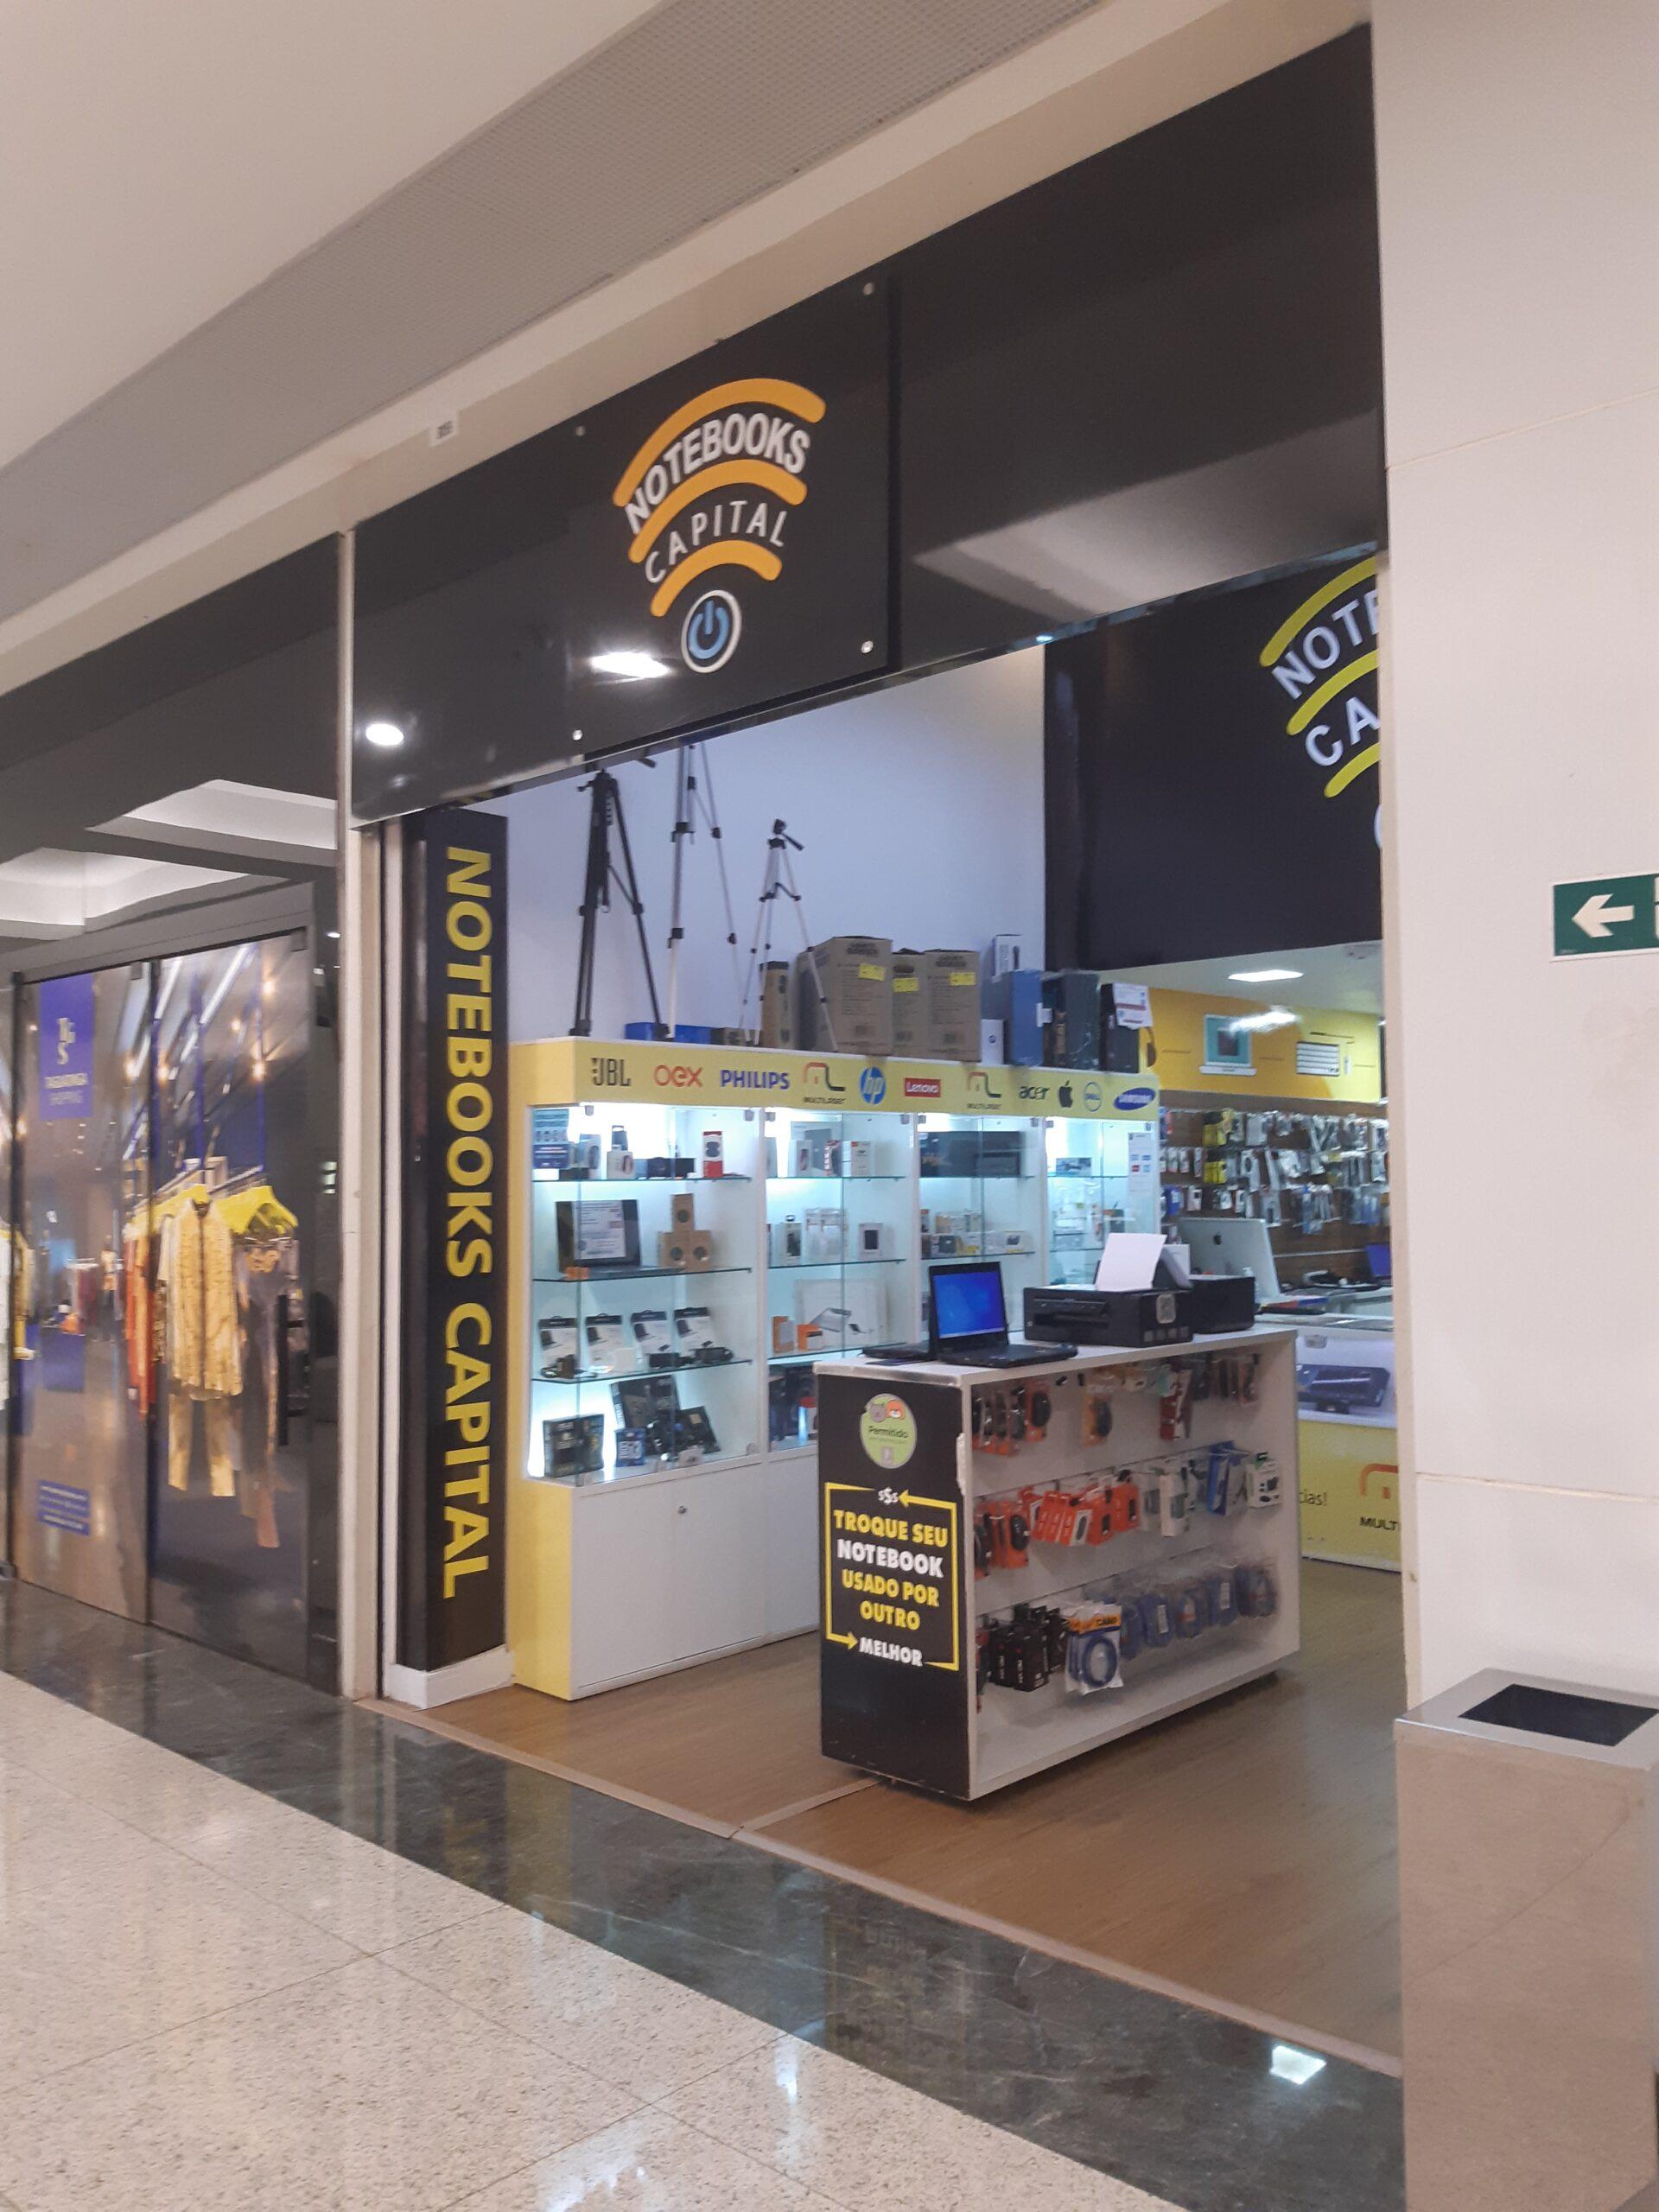 Notebooks Capital Taguatinga Shopping, Comércio Brasilia